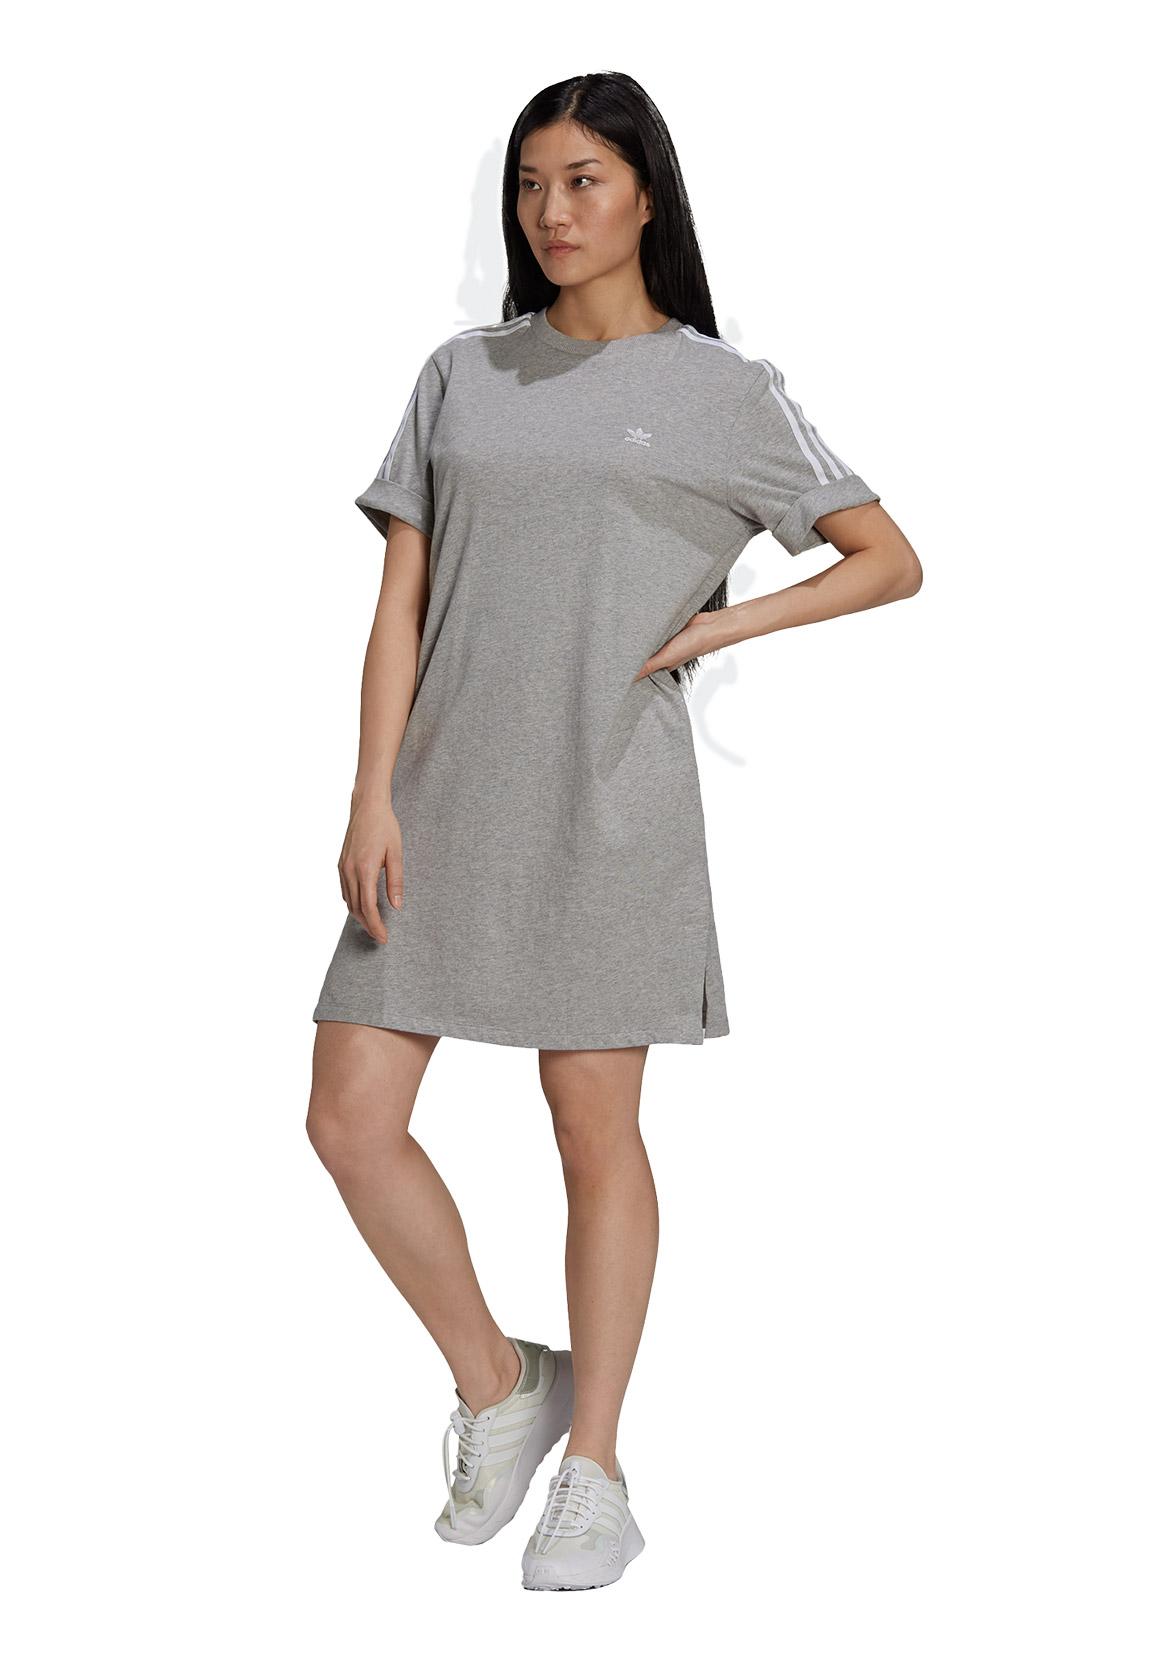 Adidas Originals Damen Kleid TEE DRESS H9 Grau